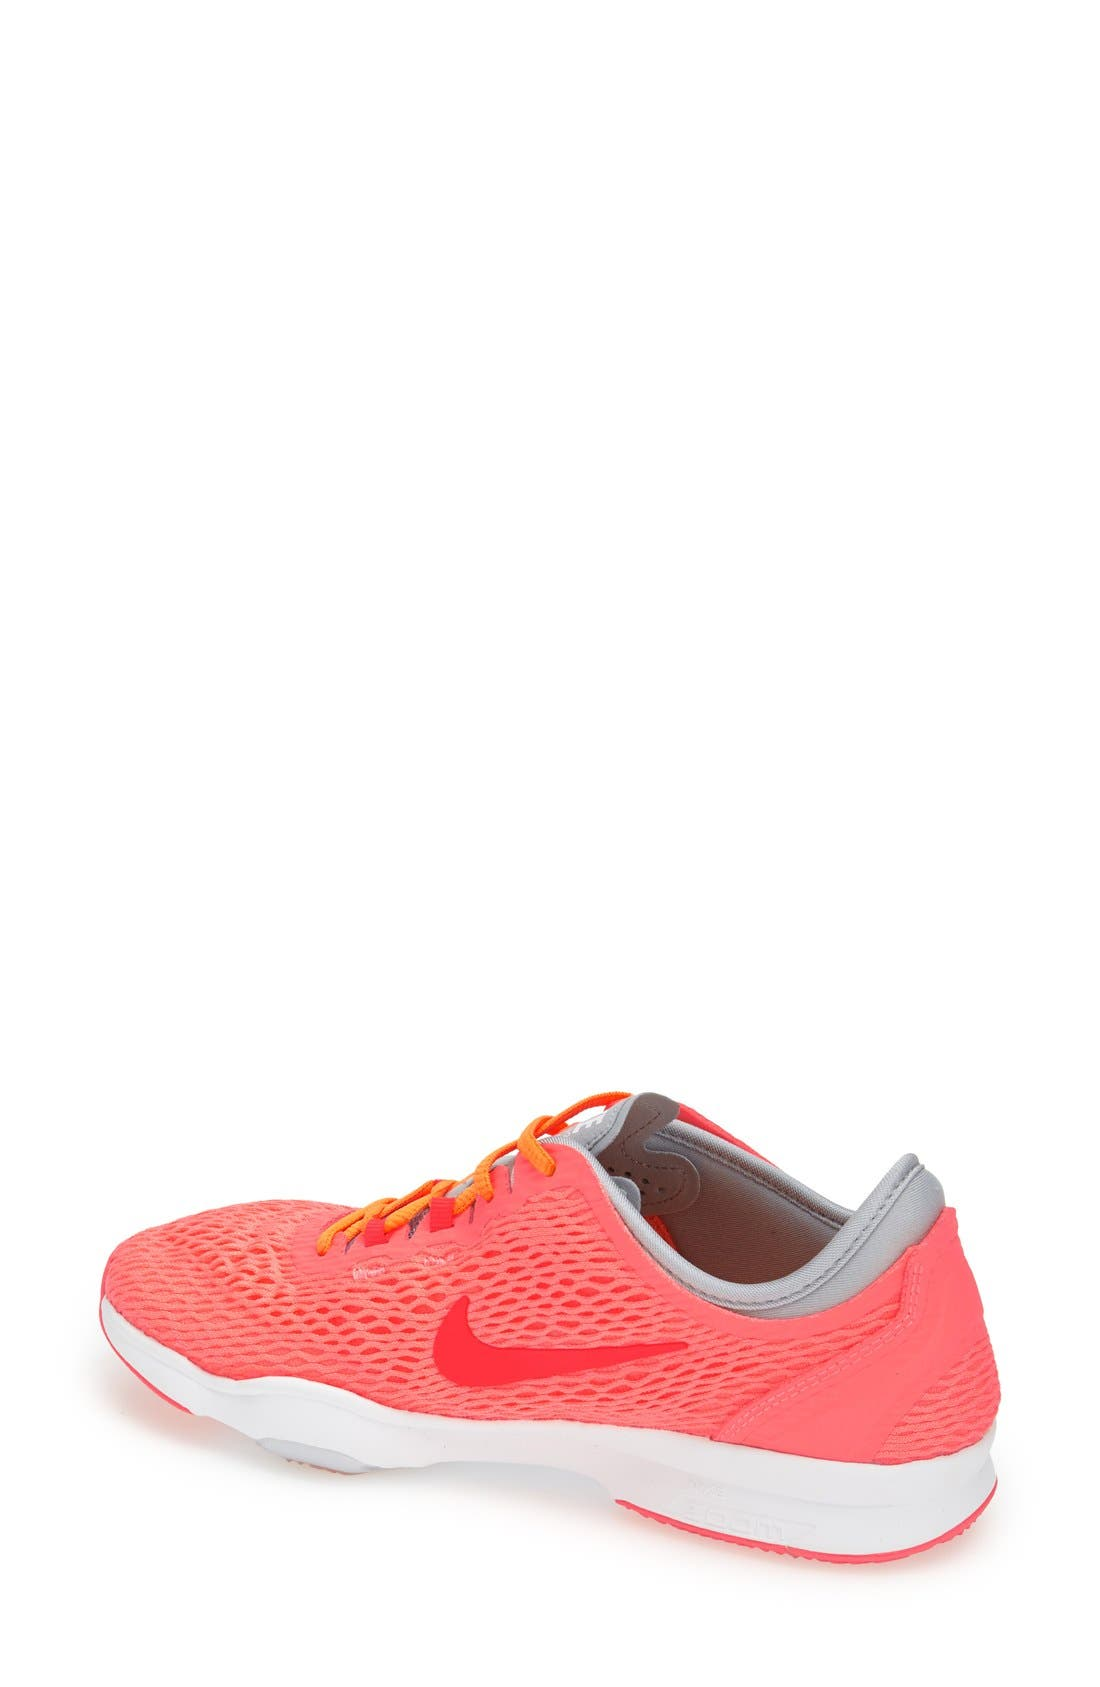 Alternate Image 2  - Nike 'Zoom Fit' Mesh Training Shoe (Women)